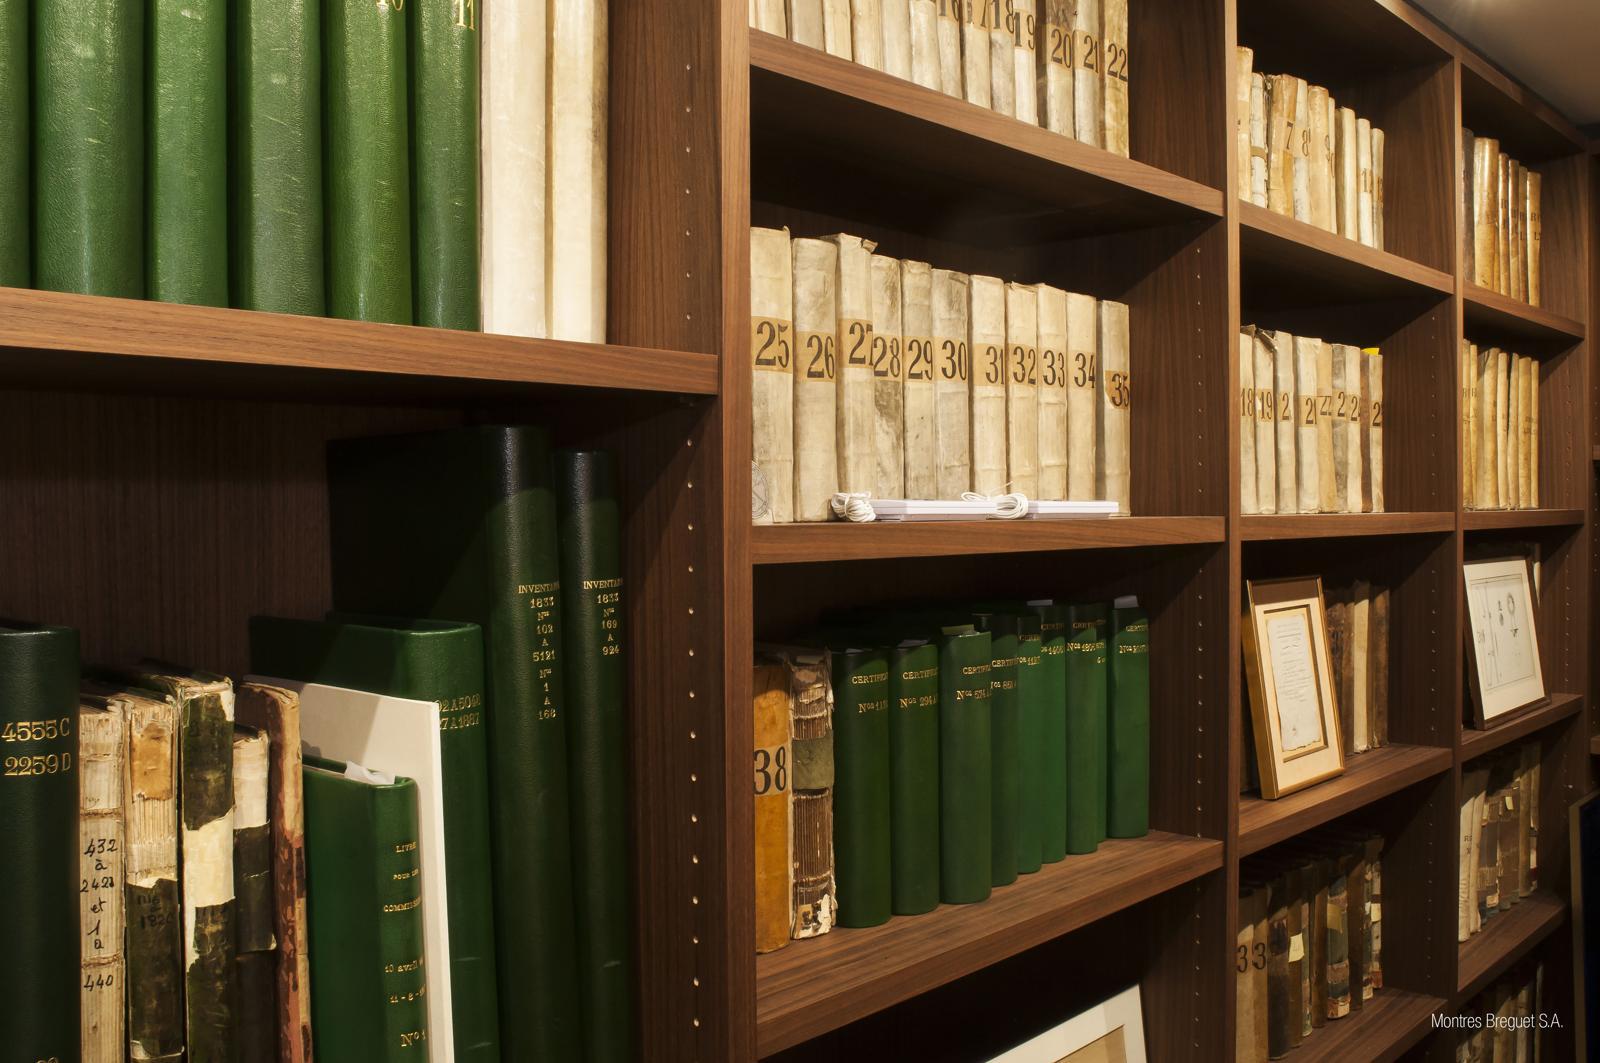 Breguet archives in its Paris Museum